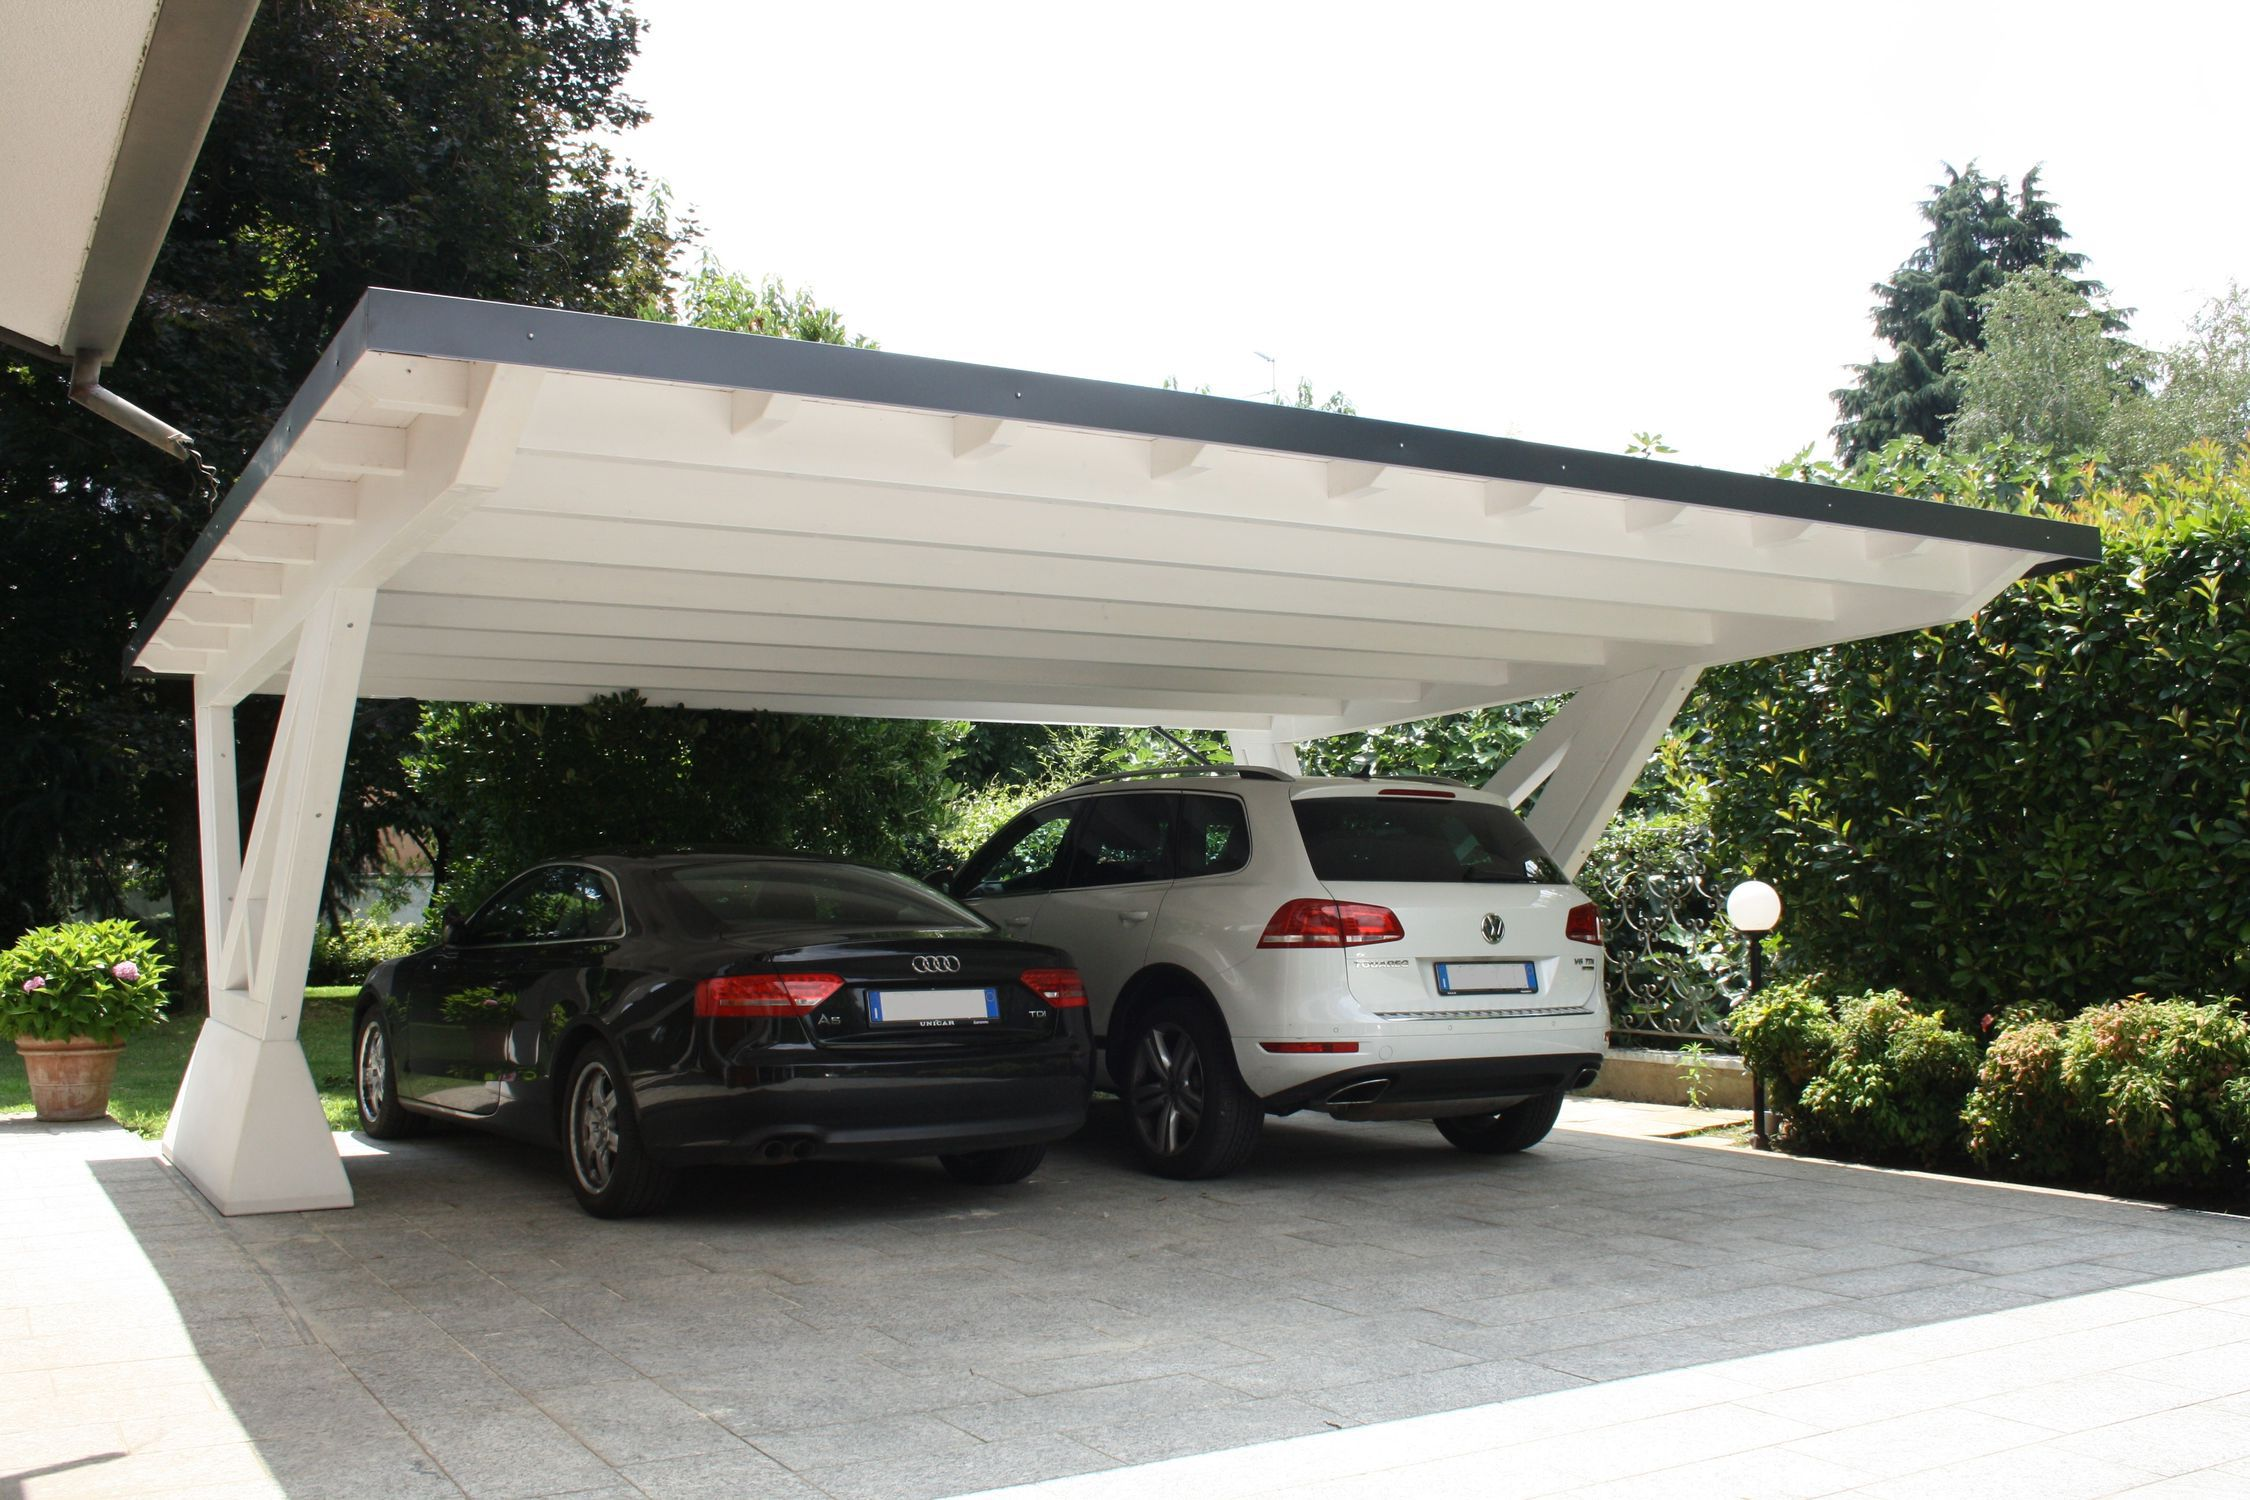 Reserve Your Cars In The Safest Stratco Carports In Sydney In 2020 Pergola Carport Modern Carport Carport Designs